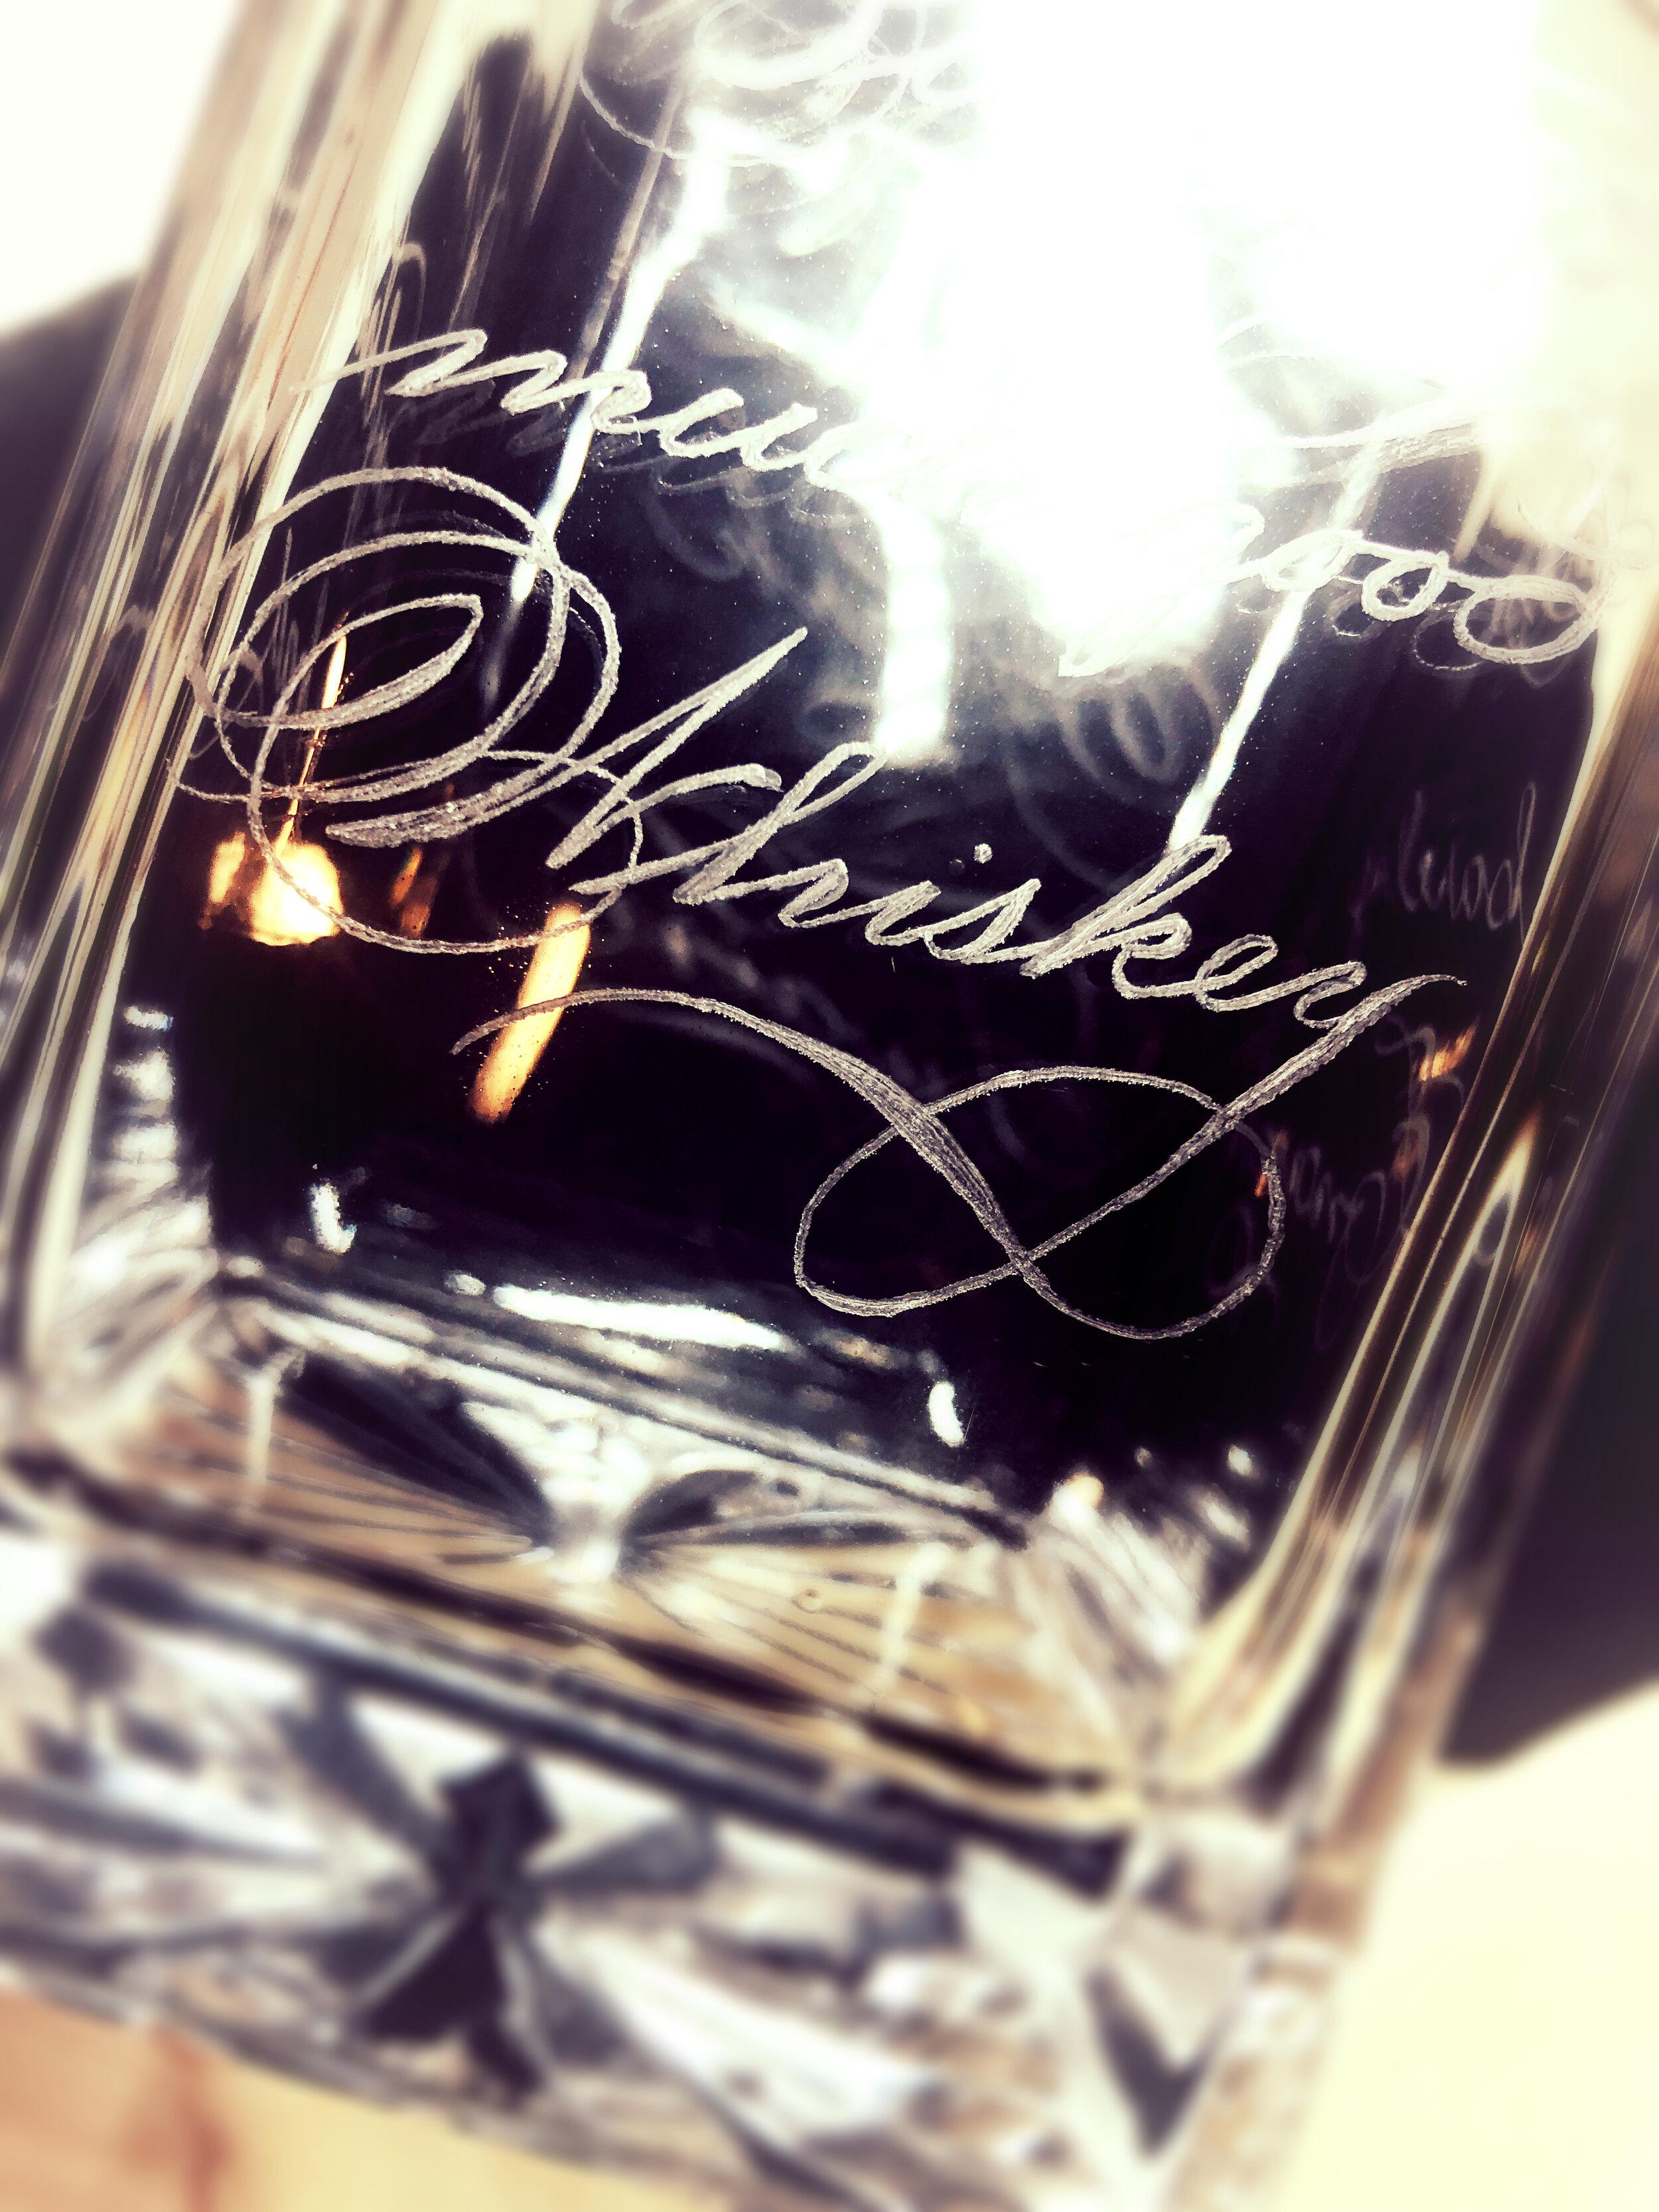 Houston wine bottle and whiskey decanter engraving